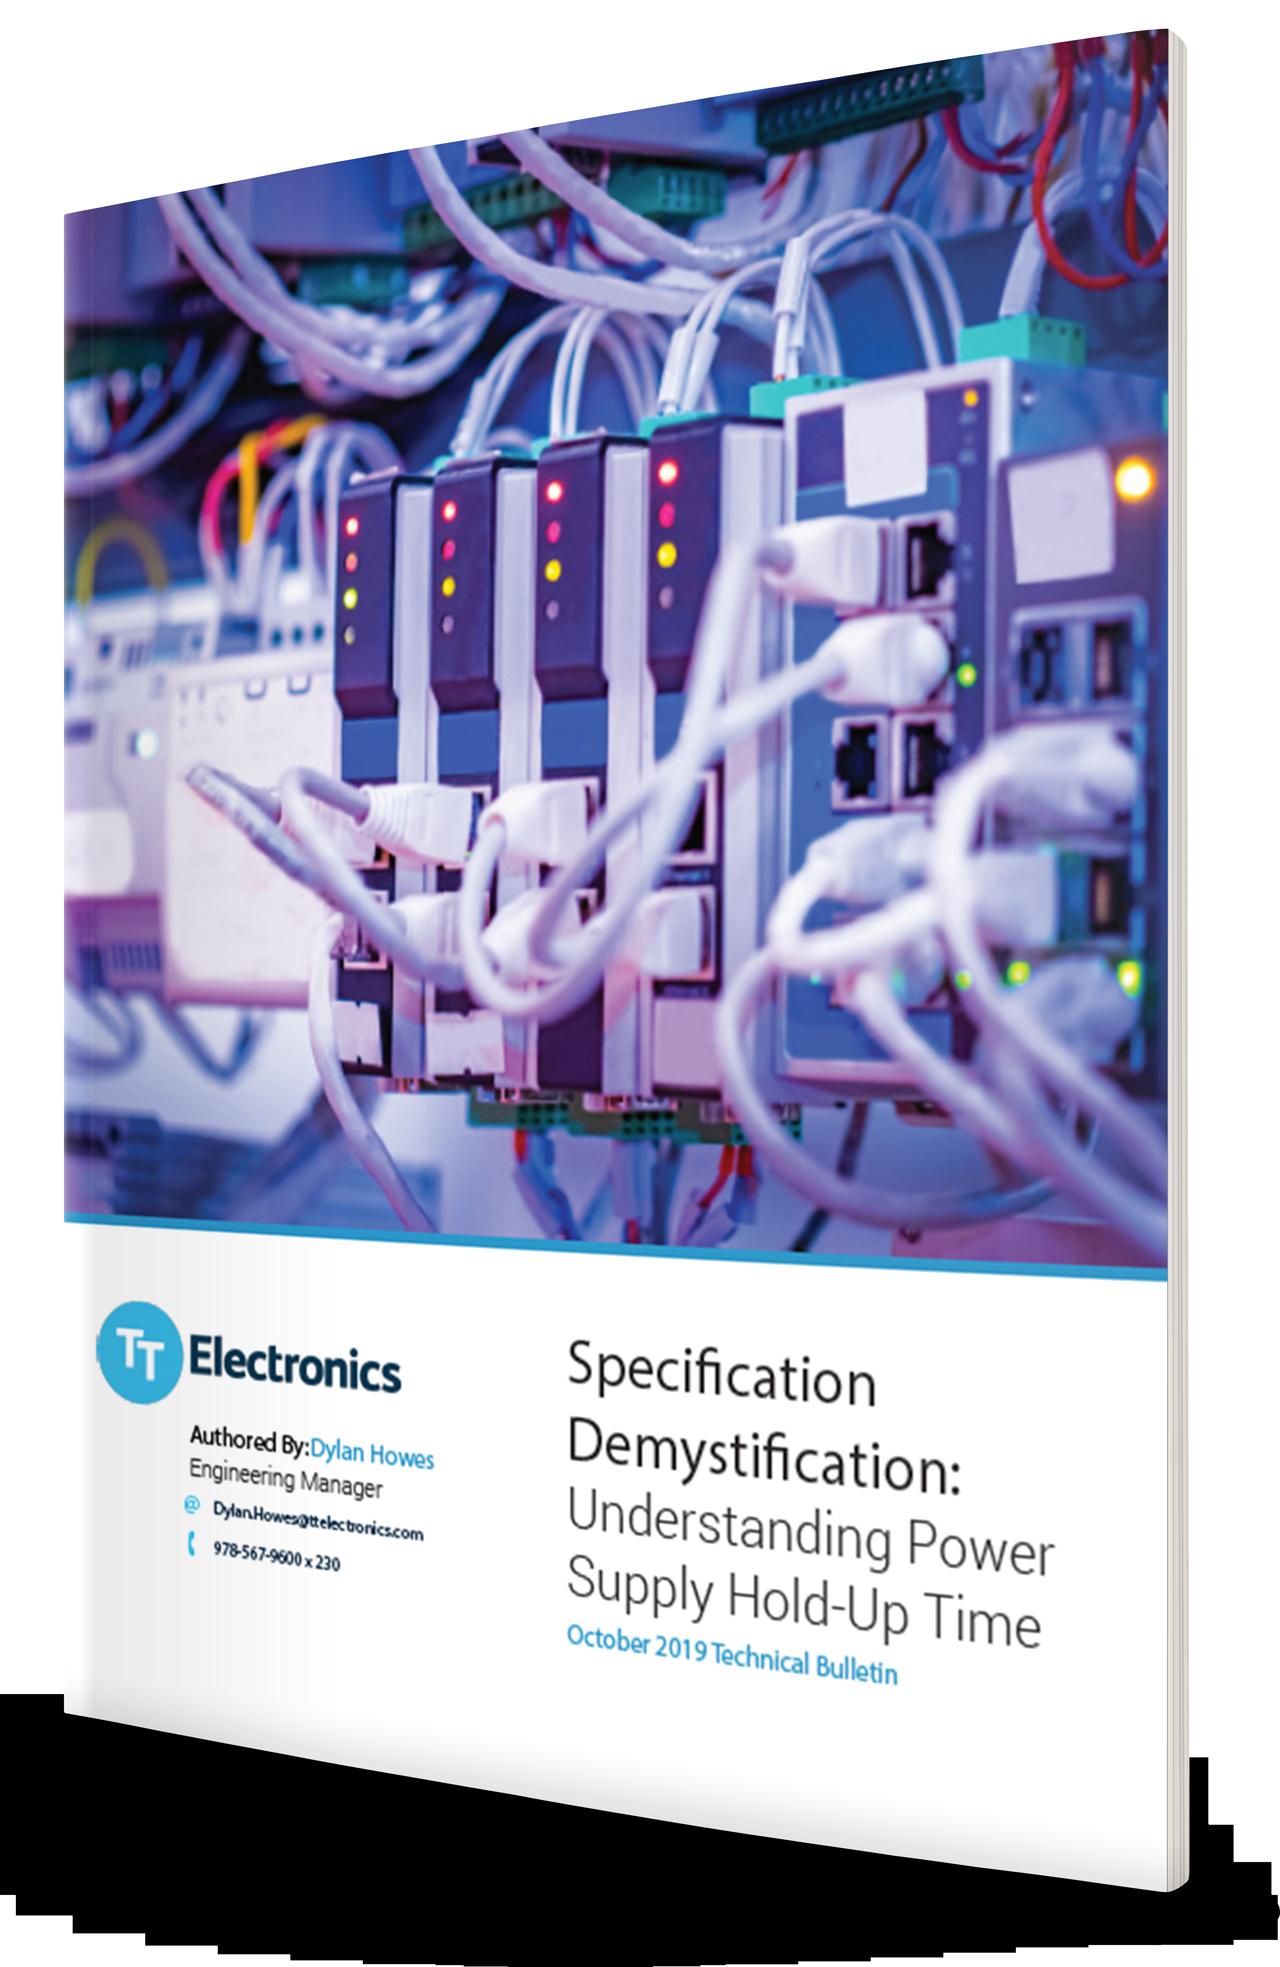 ips-october-2019-technical-bulletin-cover